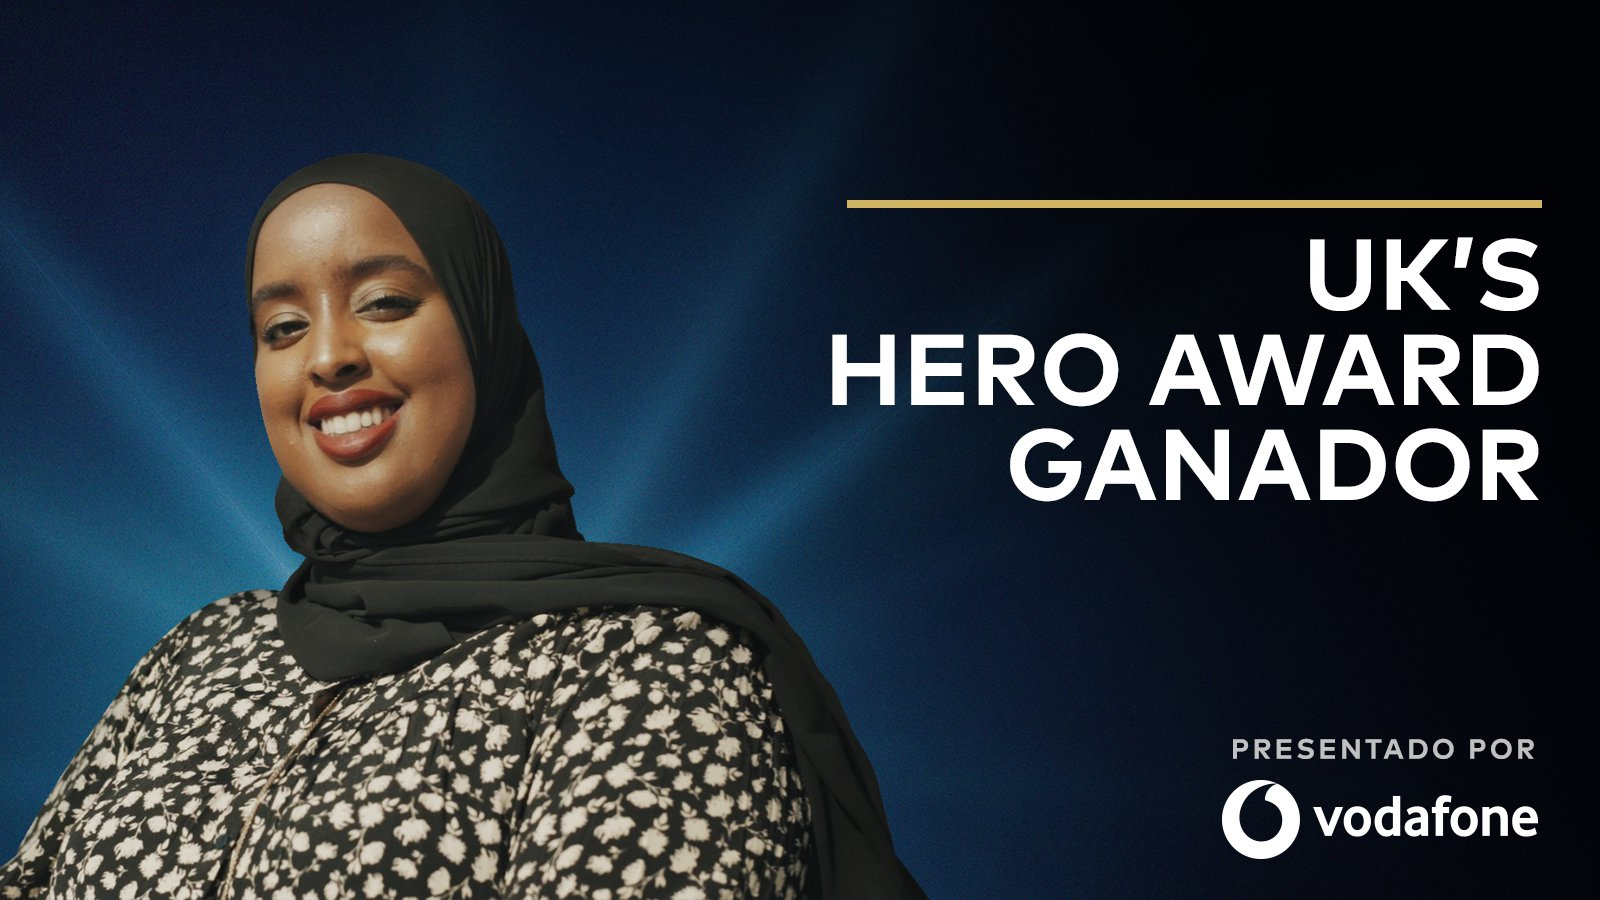 UK's Hero Award